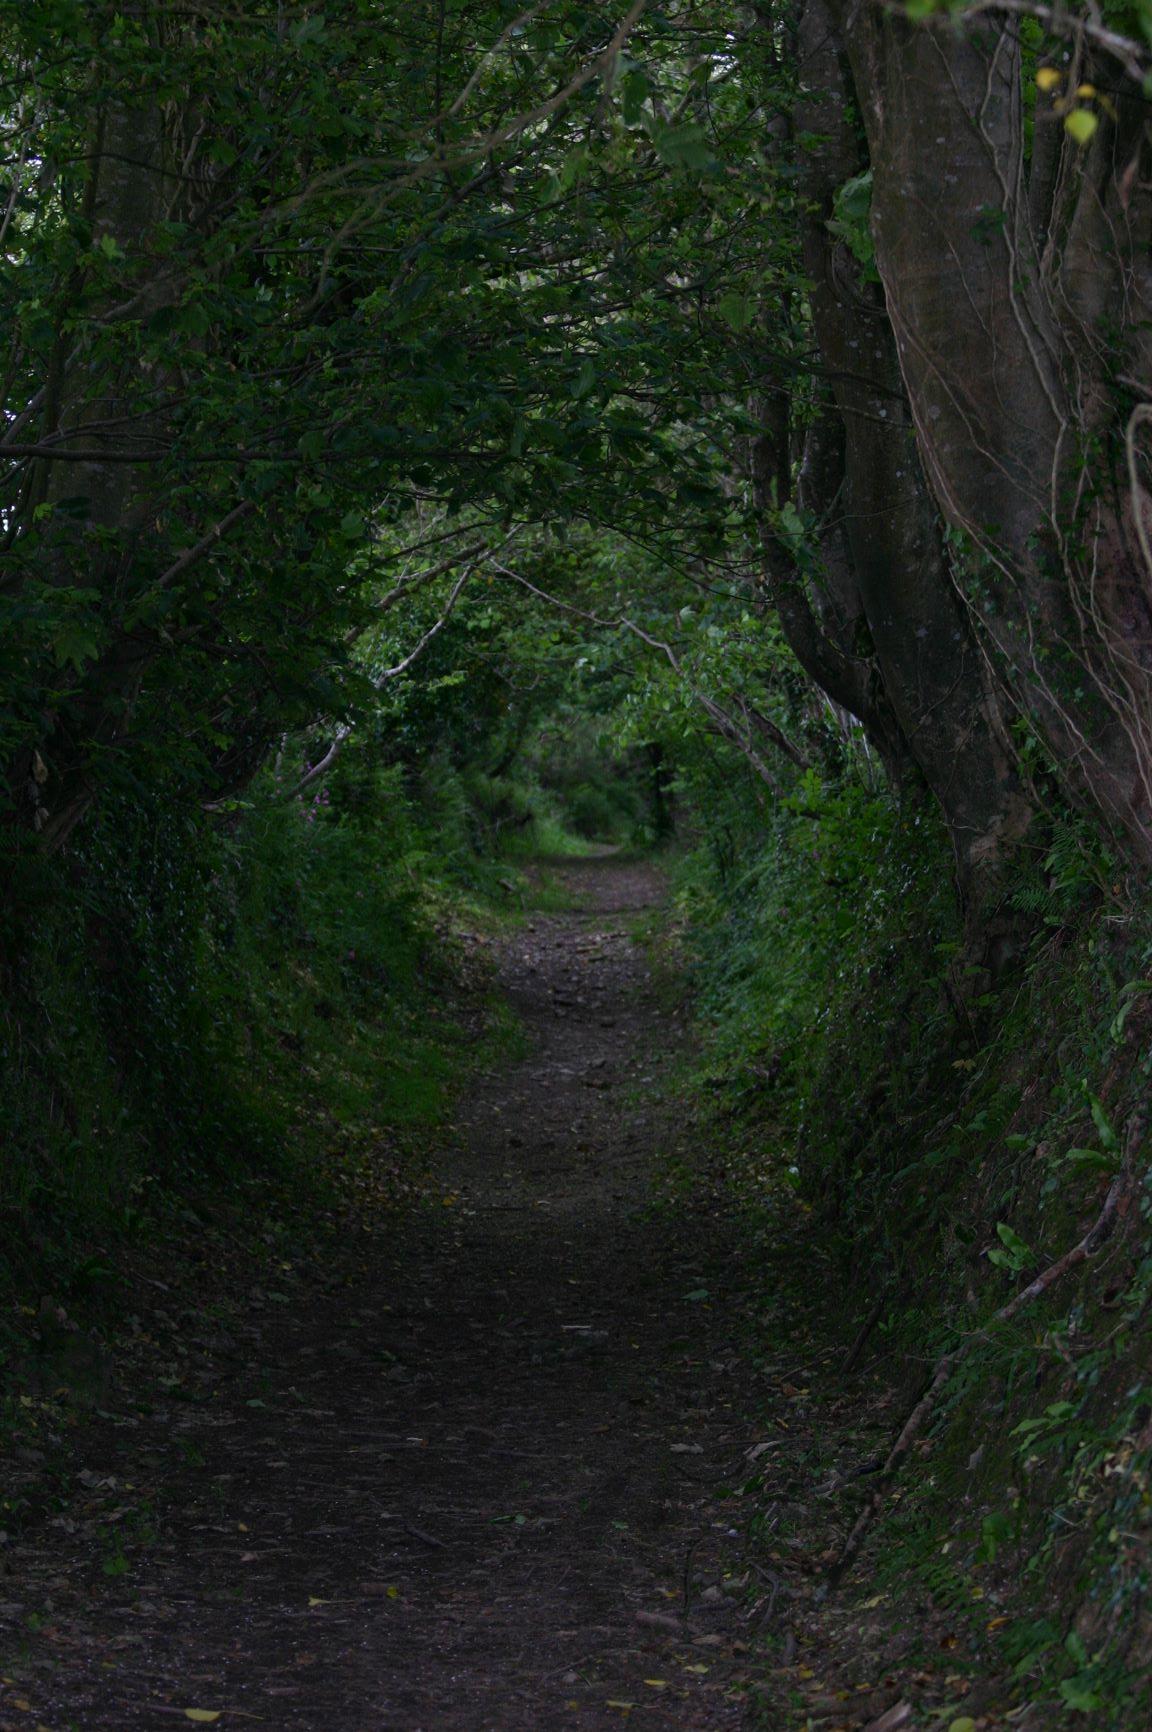 Fae path